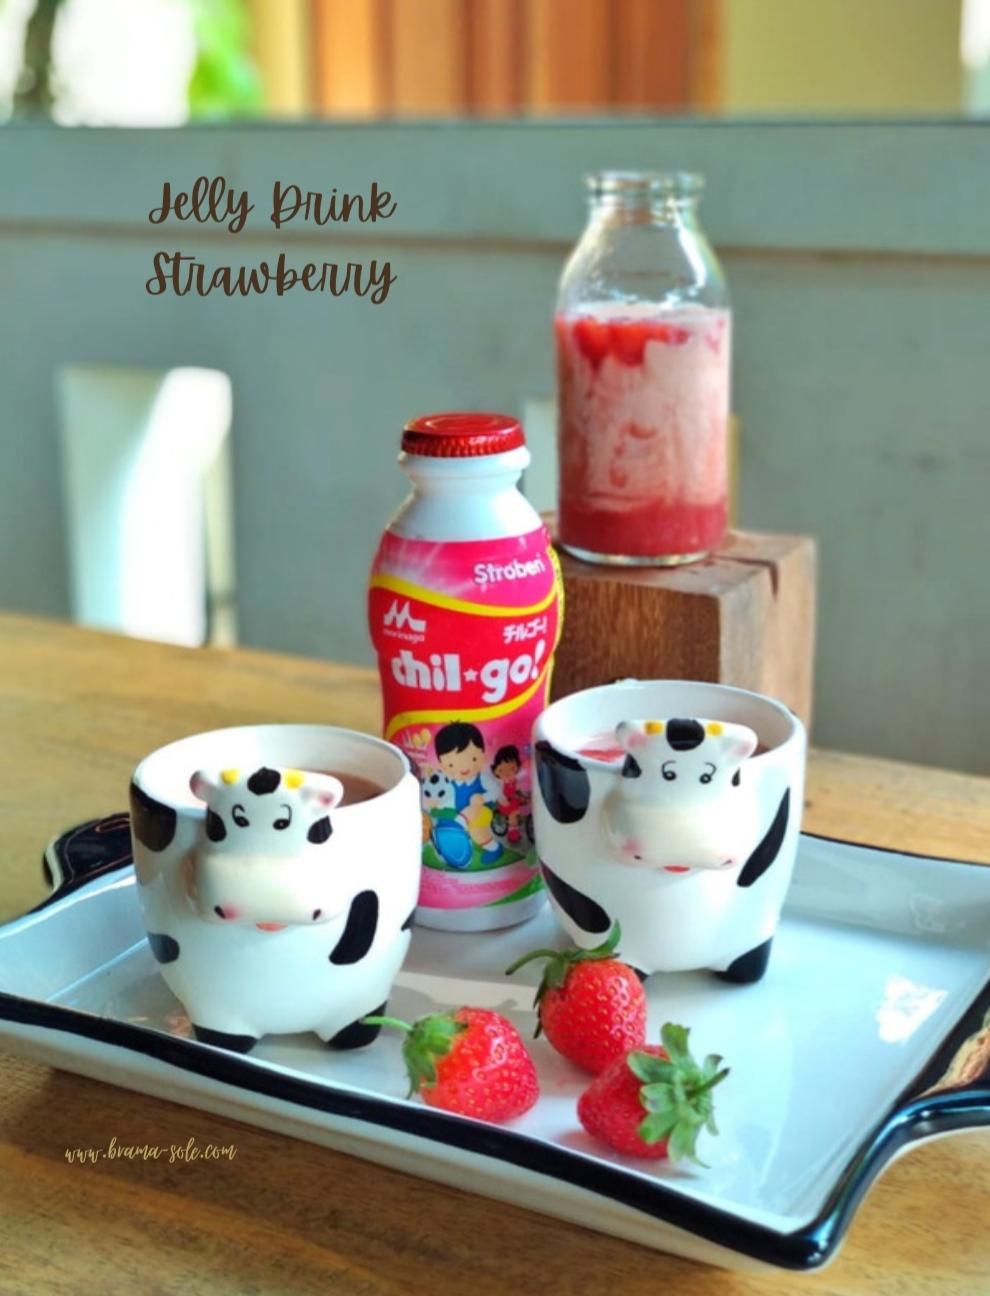 Strawberry Milk Jelly Drink